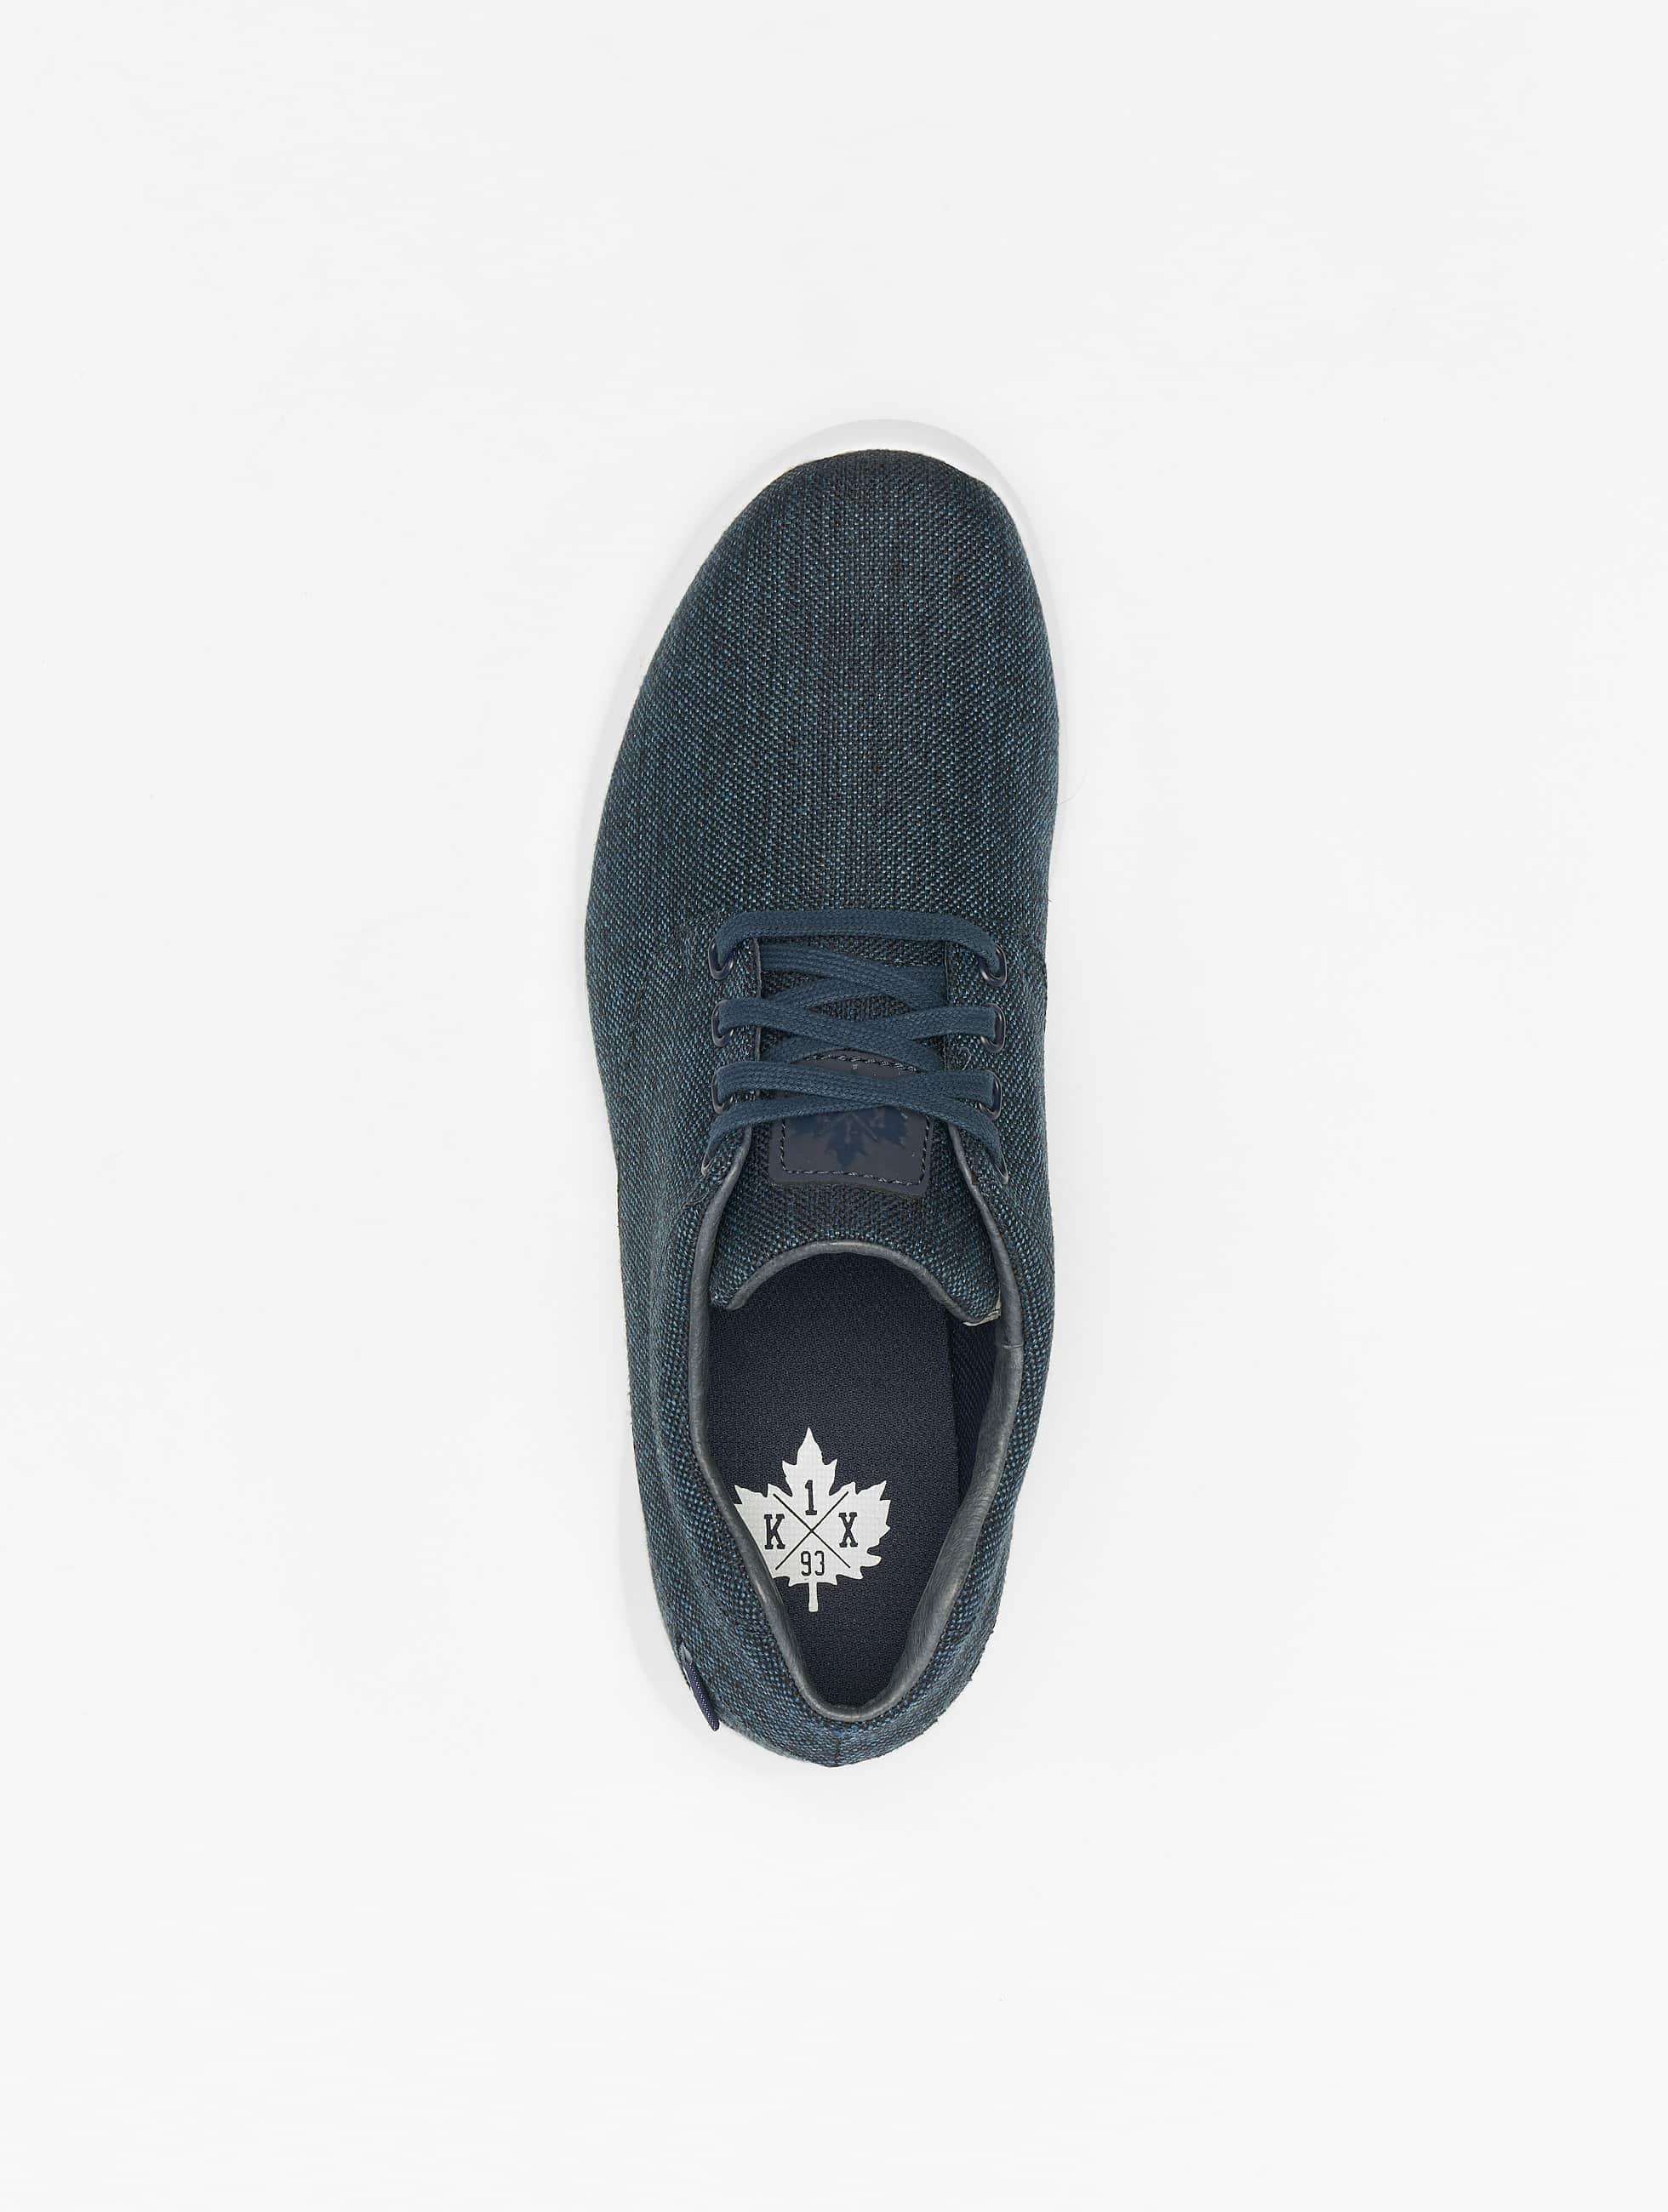 K1X Sneakers Dress Up Light Weight niebieski